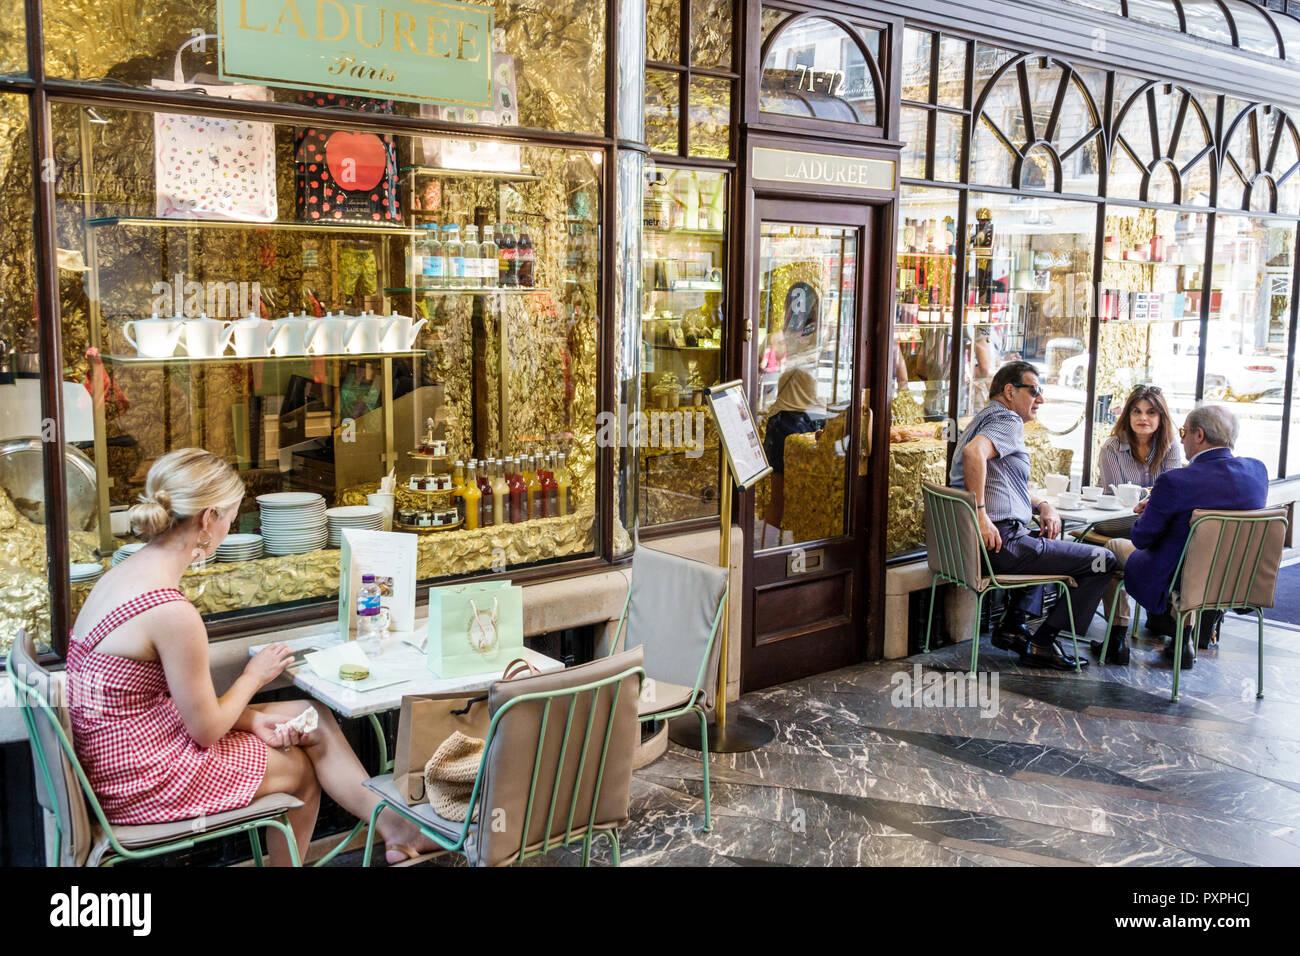 London England United Kingdom Great Britain Mayfair Burlington Arcade shopping upmarket luxury covered pedestrian arcade Laduree restaurant tea room F - Stock Image